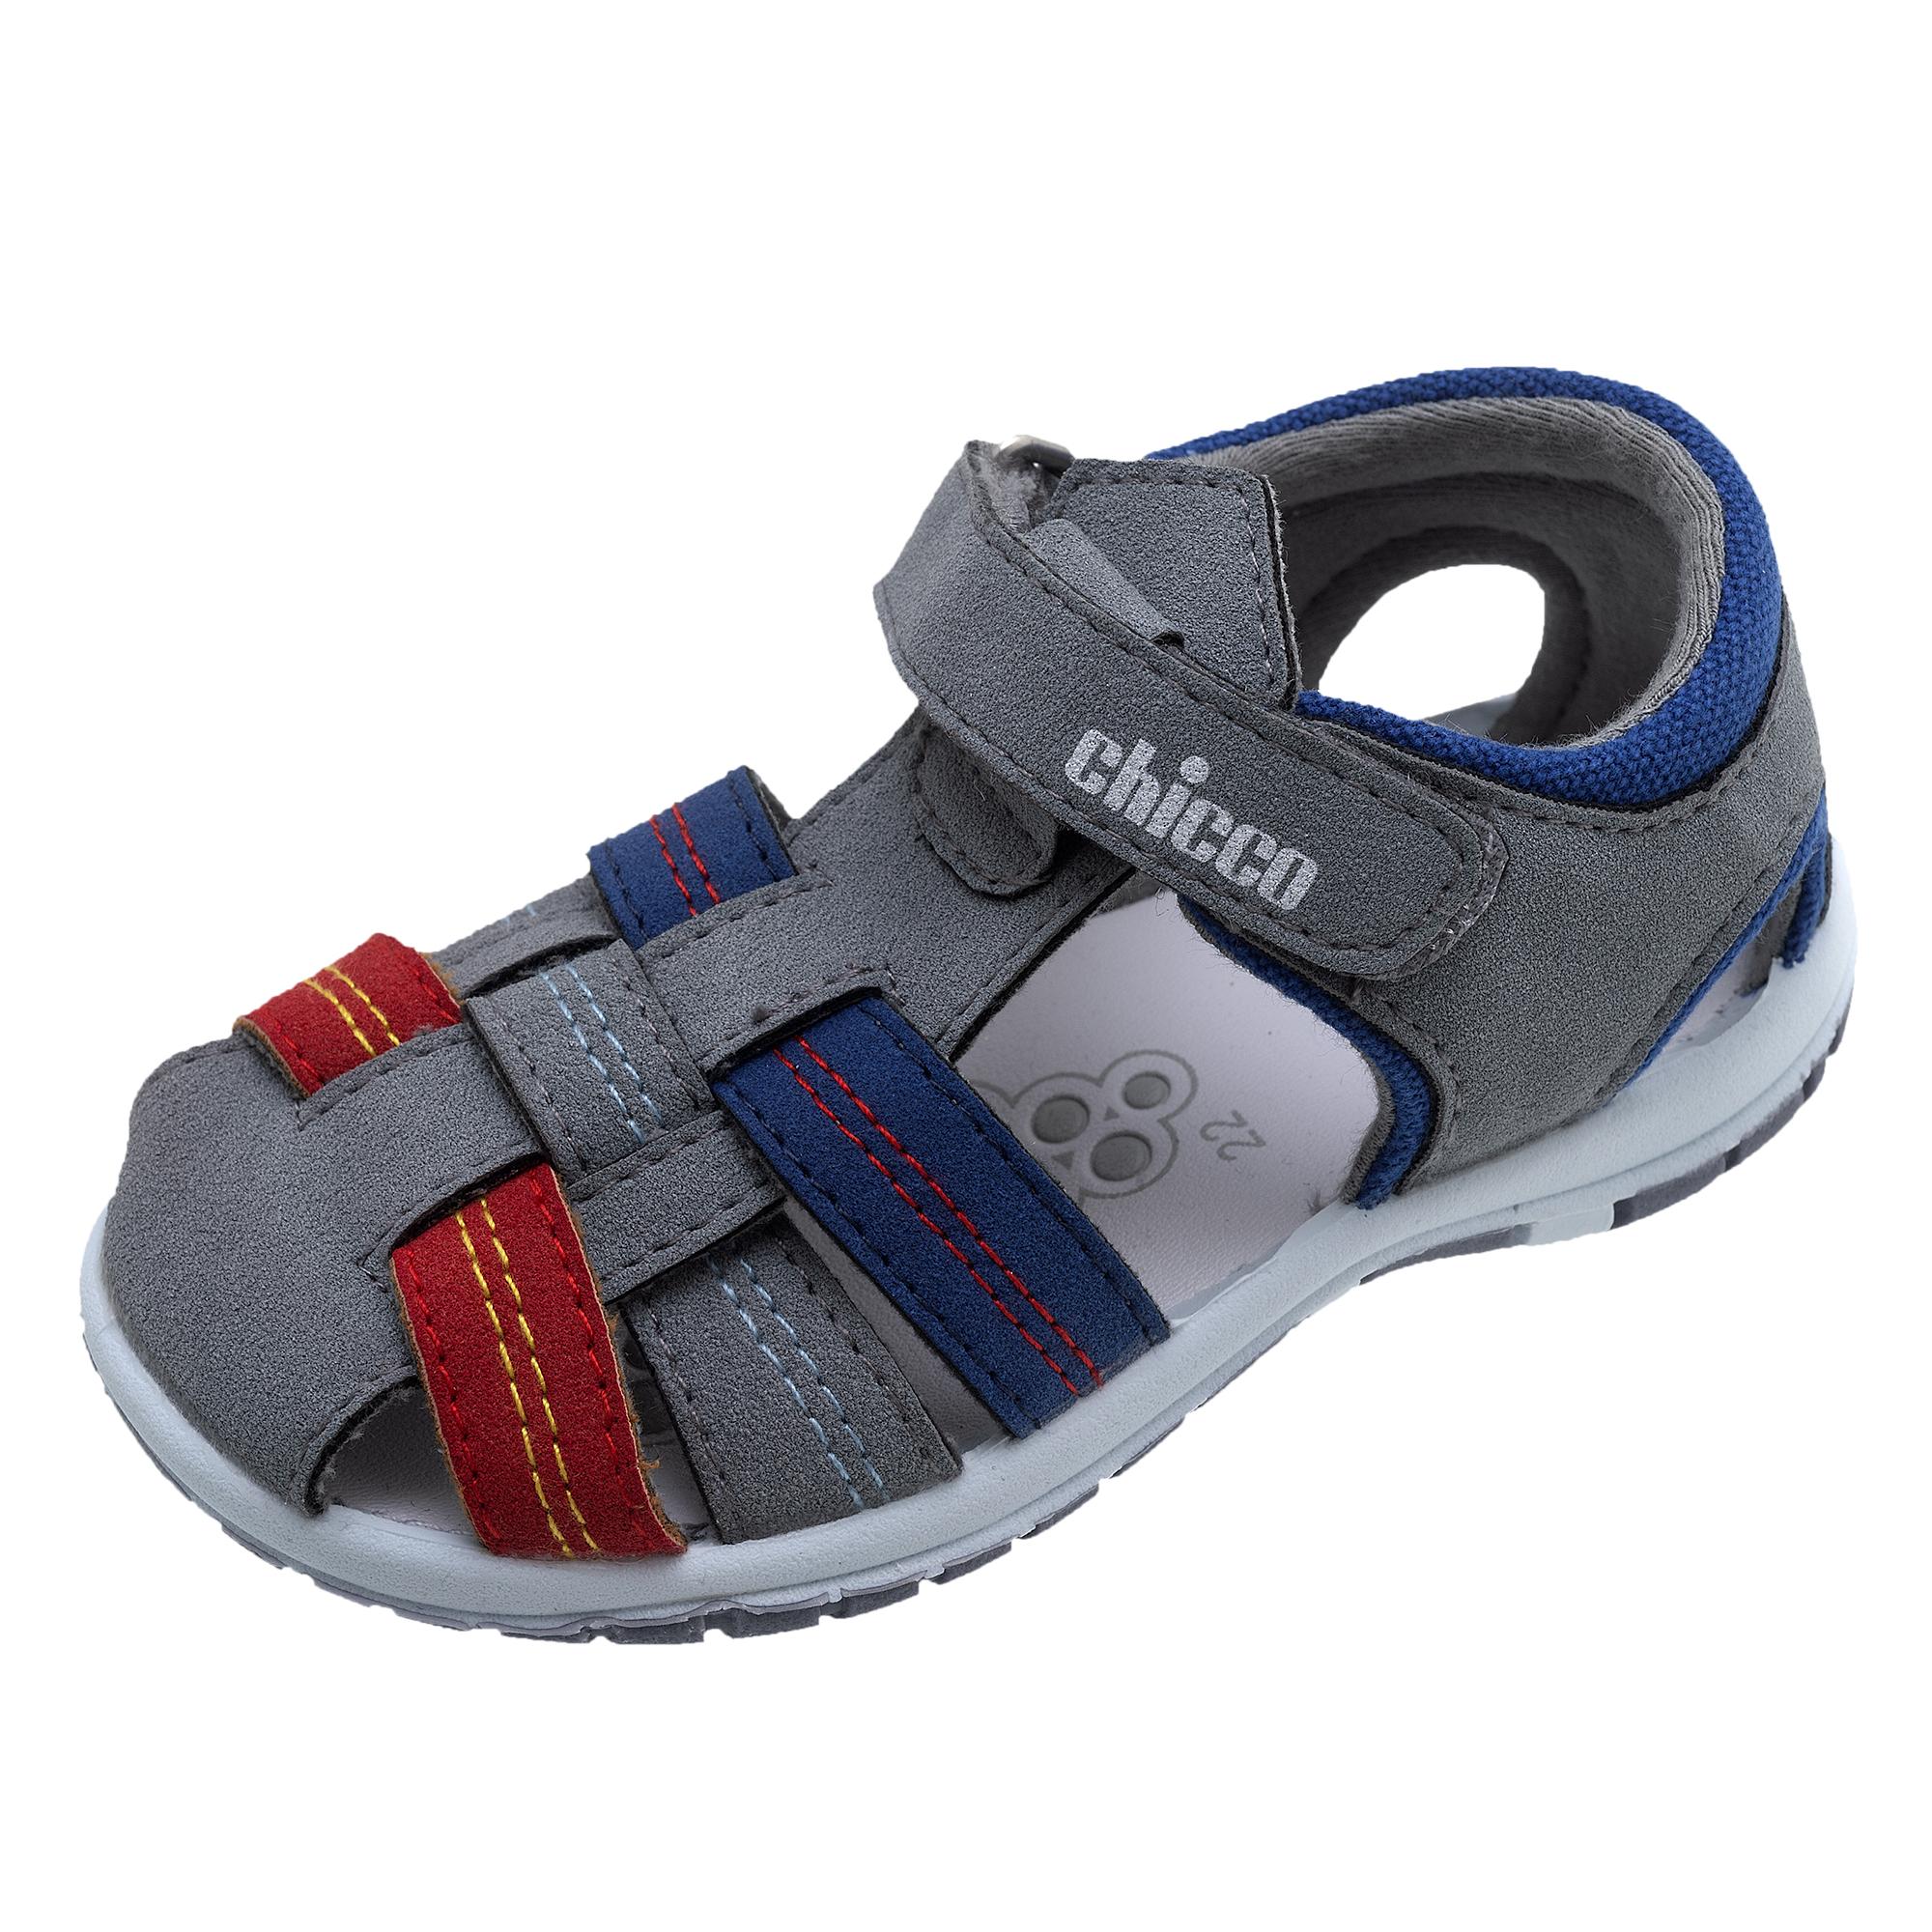 Sandale copii Chicco Fausto gri inchis